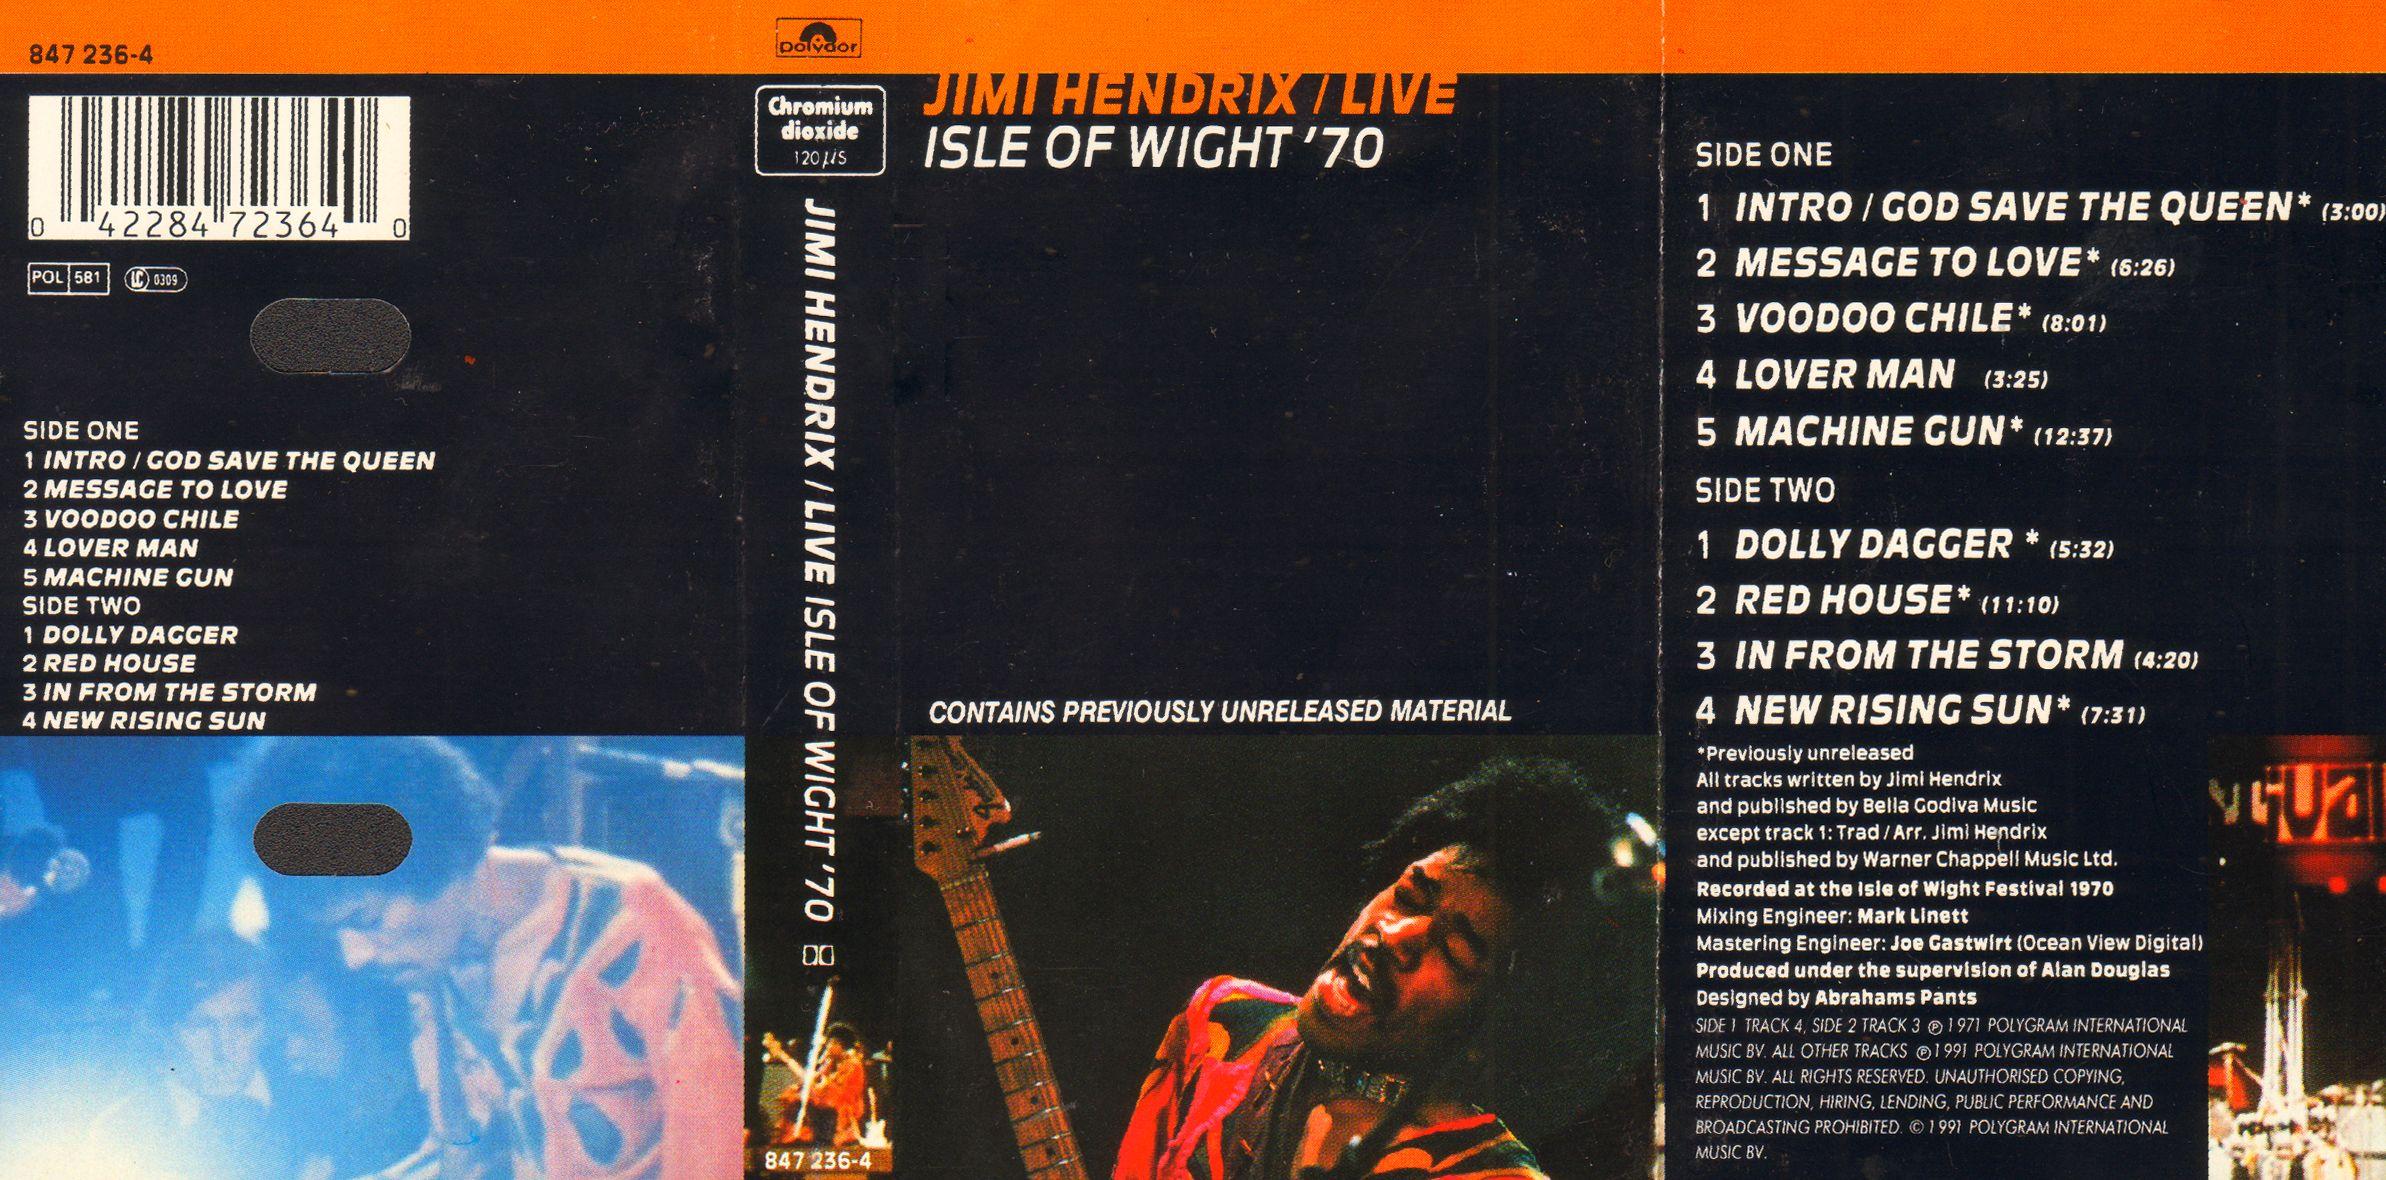 Live Isle Of Wight '70 (1991) 1991IsleOfWightK7BackMCA847.236-4